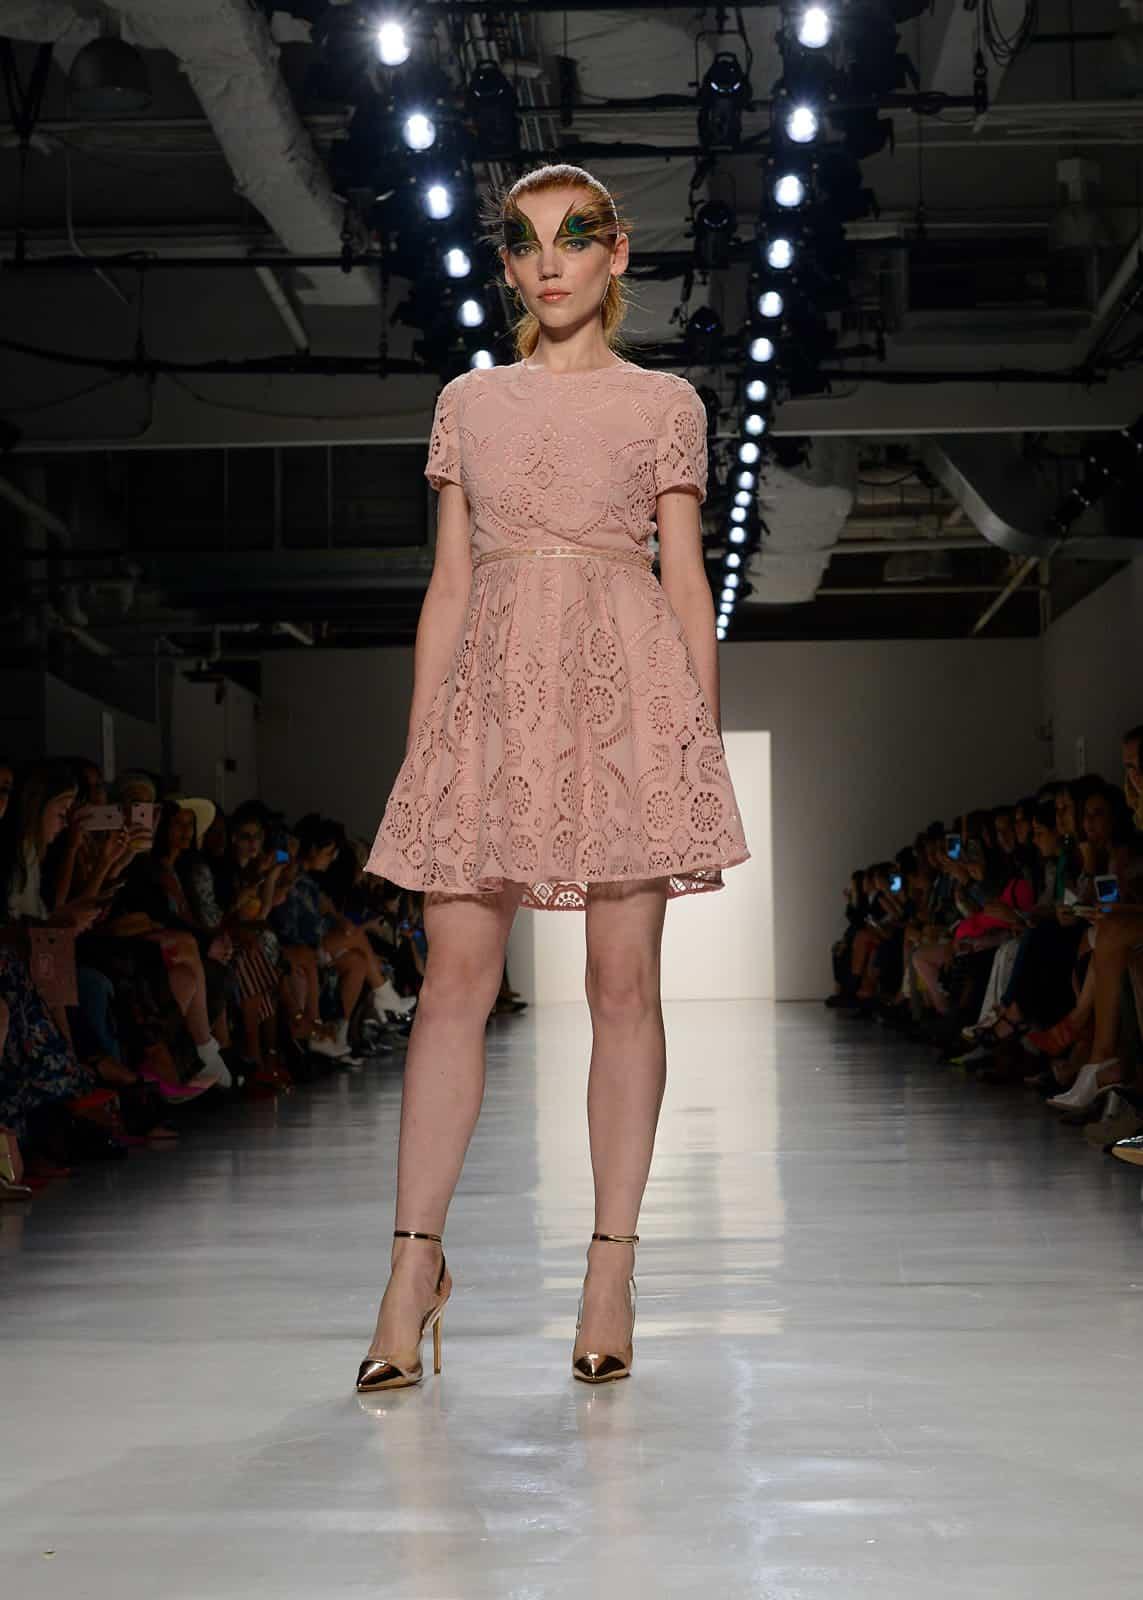 Dan Liu Inspires the Modern Feminine Wardrobe with Spring Cocktail ...